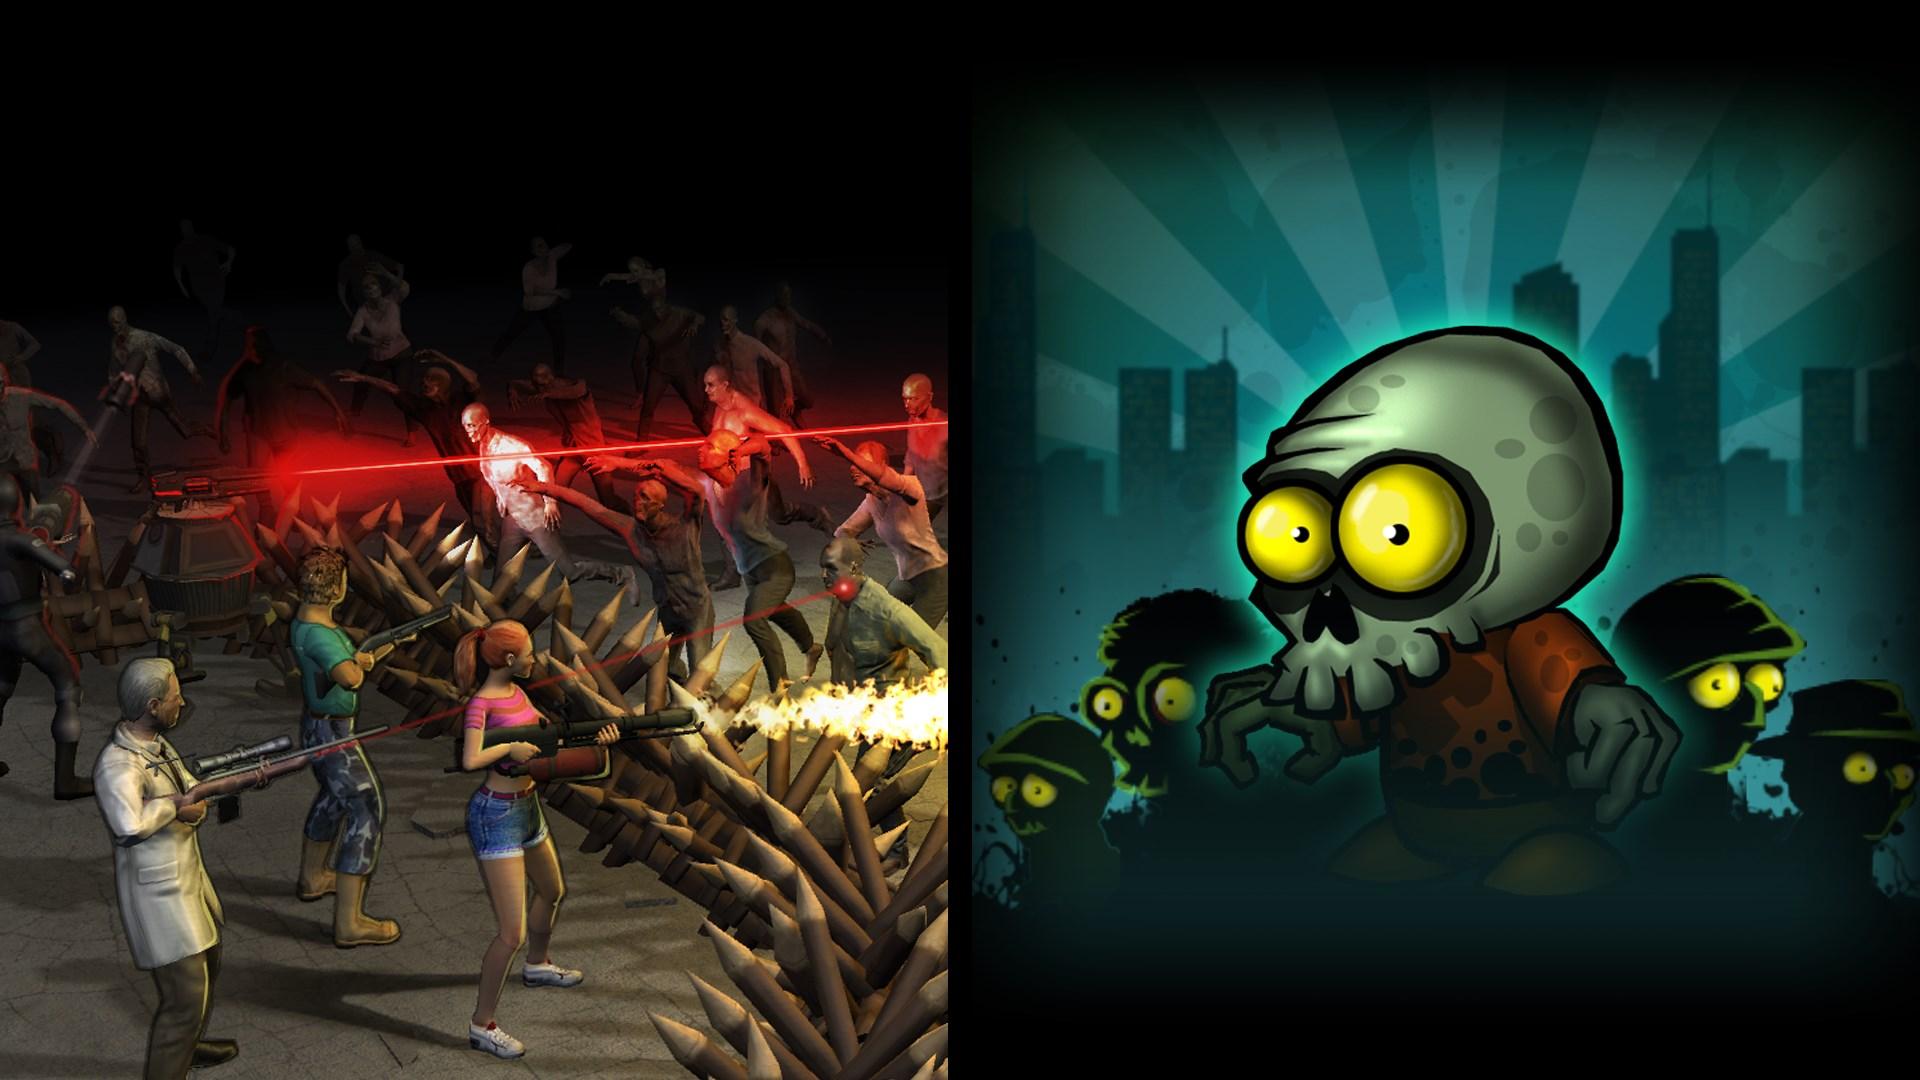 Coole Zombie Spiele